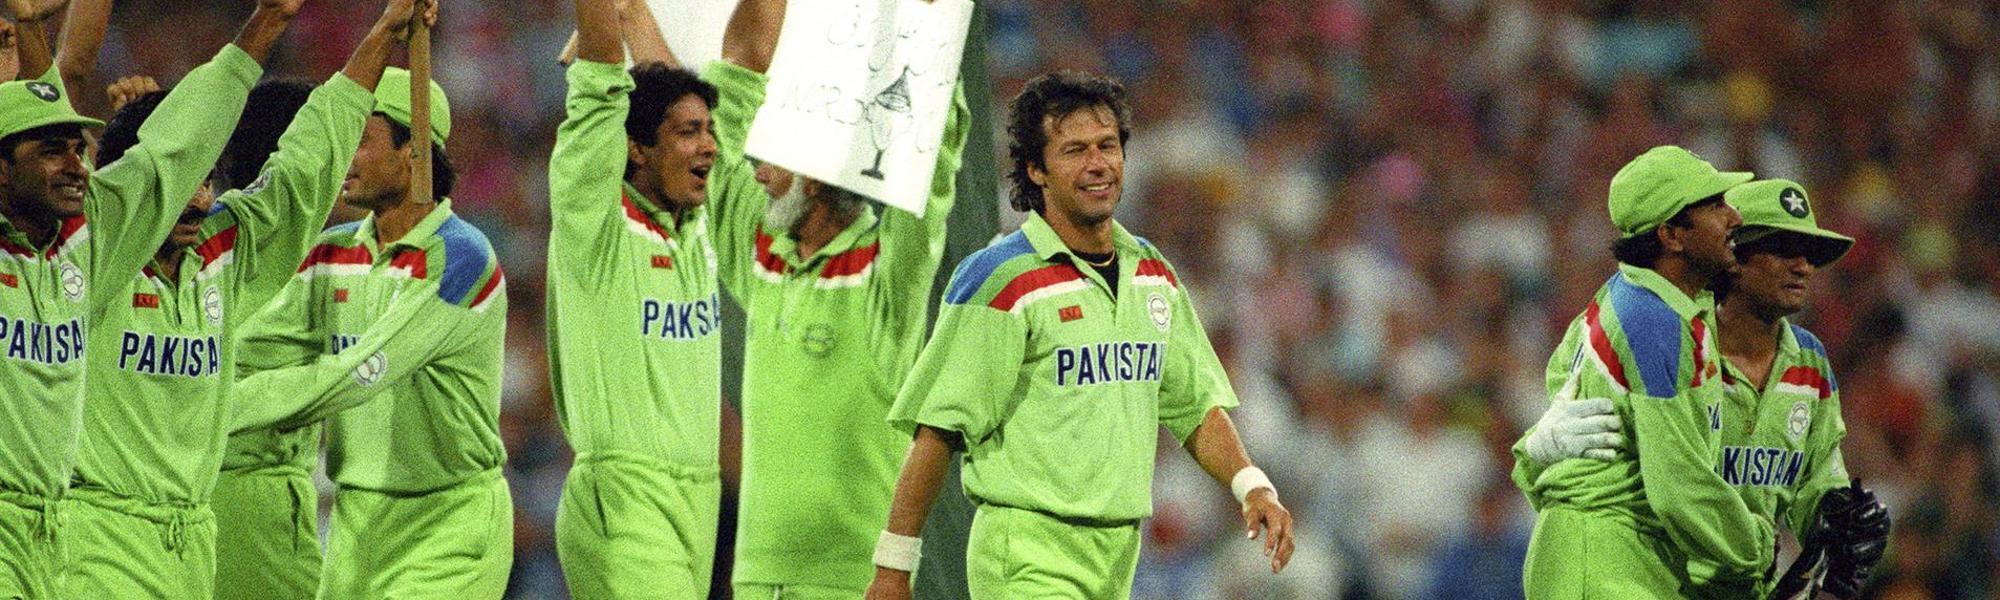 Pakistan champions.jpg